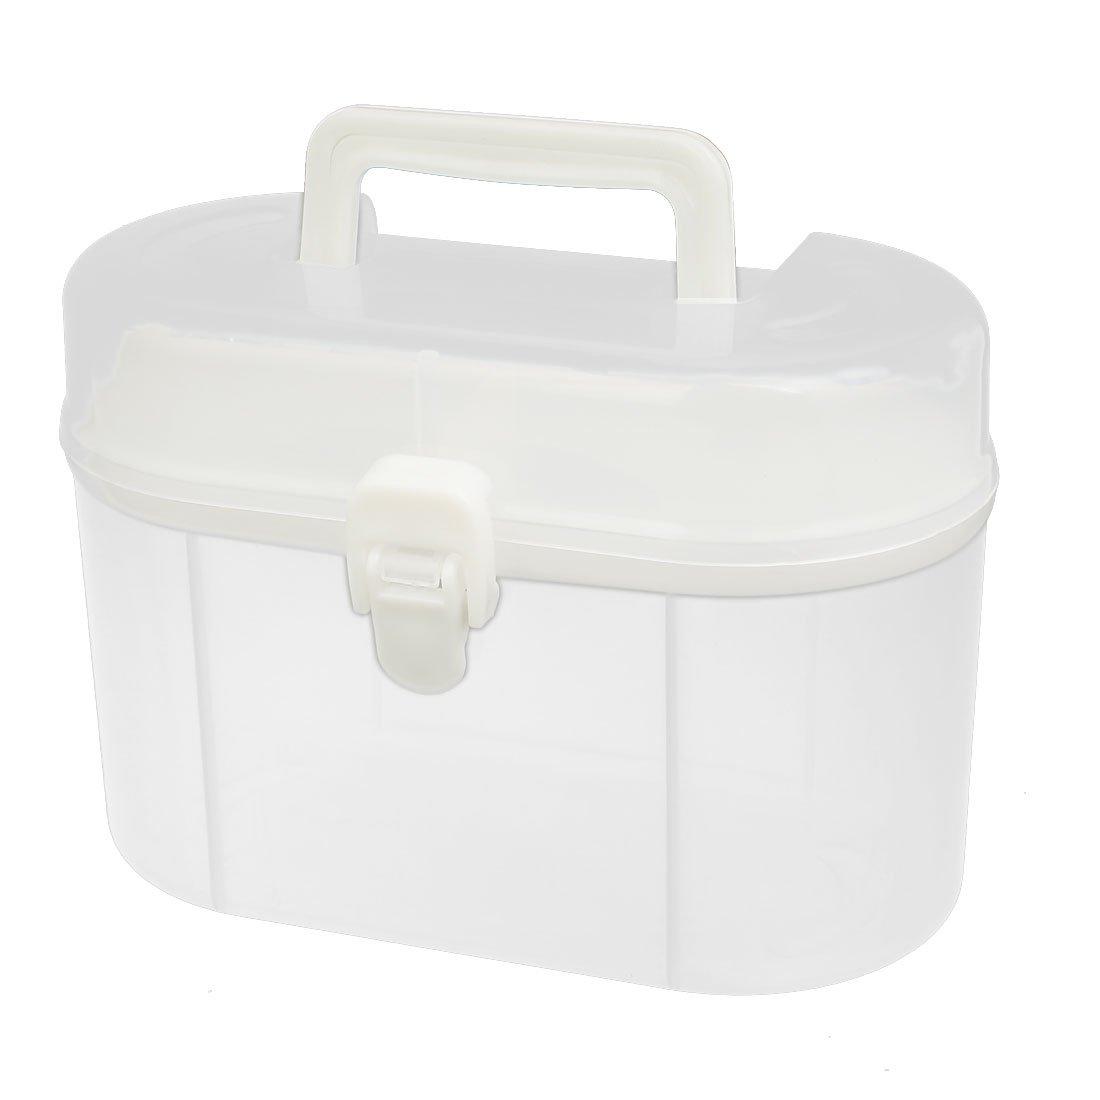 uxcell 180mmx90mmx125mm Plastic Portable Component Storage Organizer Case Toy DIY Tool